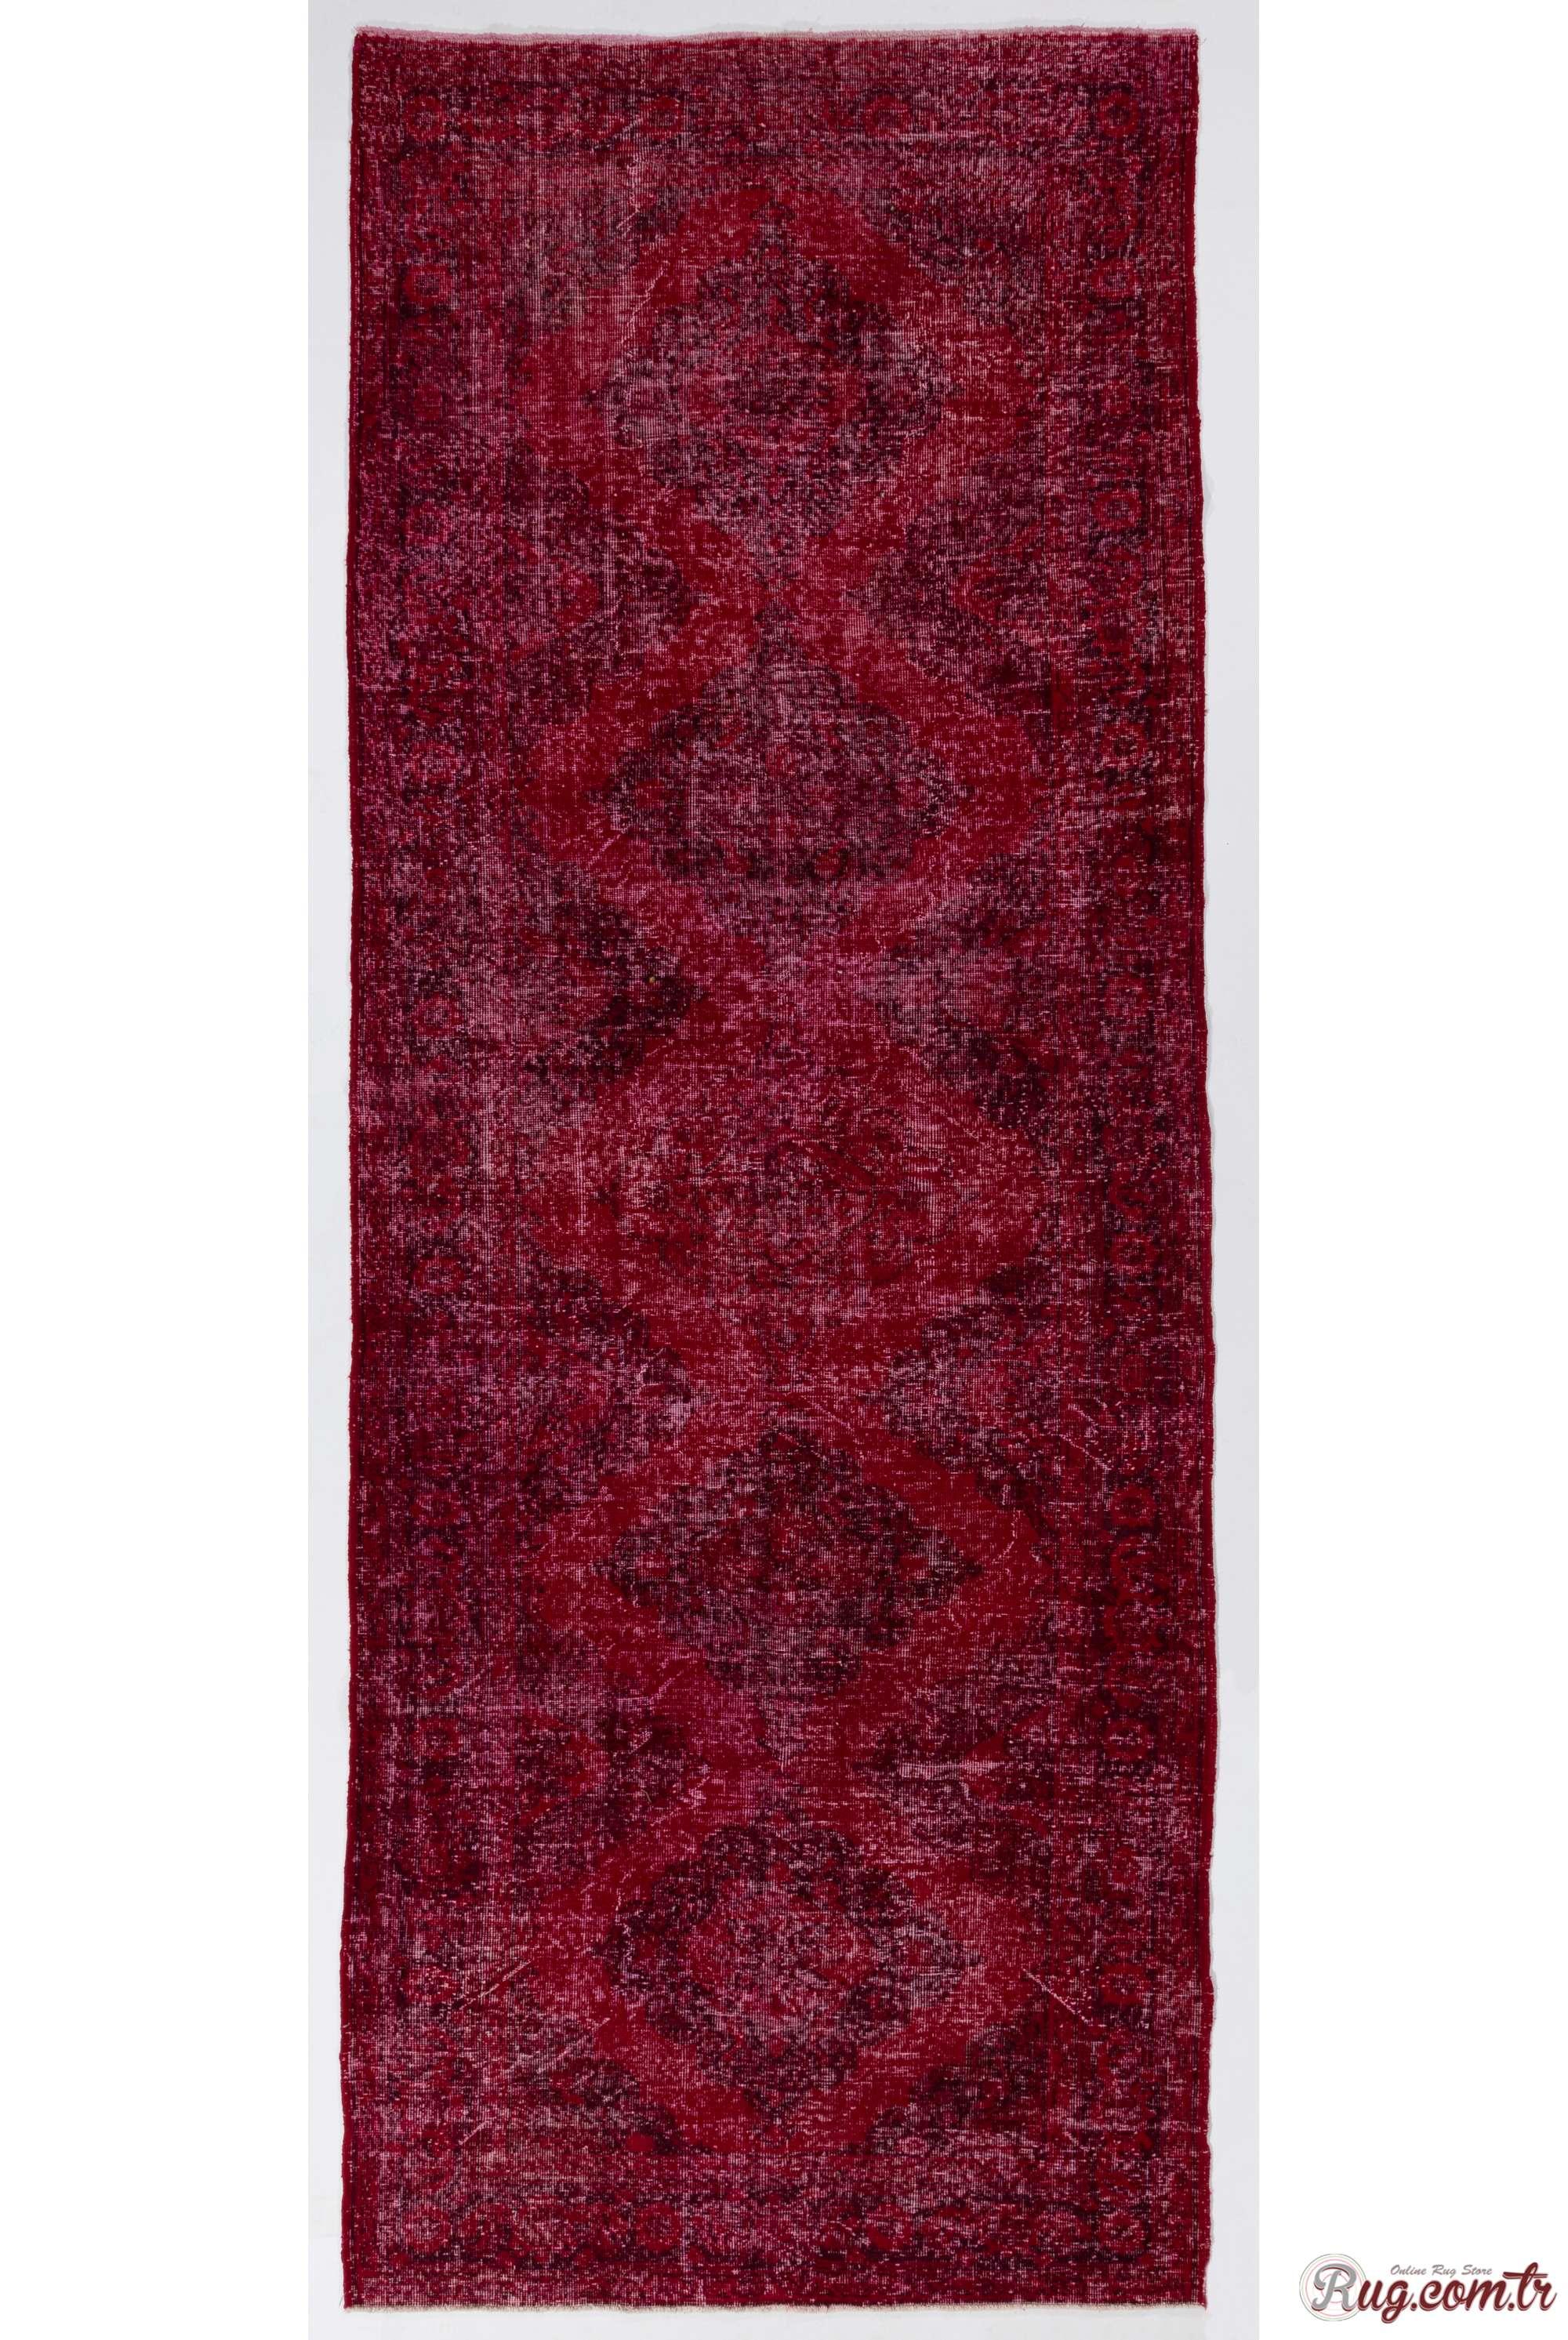 Red Runner Rug 4 9 X 12 7 147 386 Cm Color Vintage Overdyed Handmade Turkish